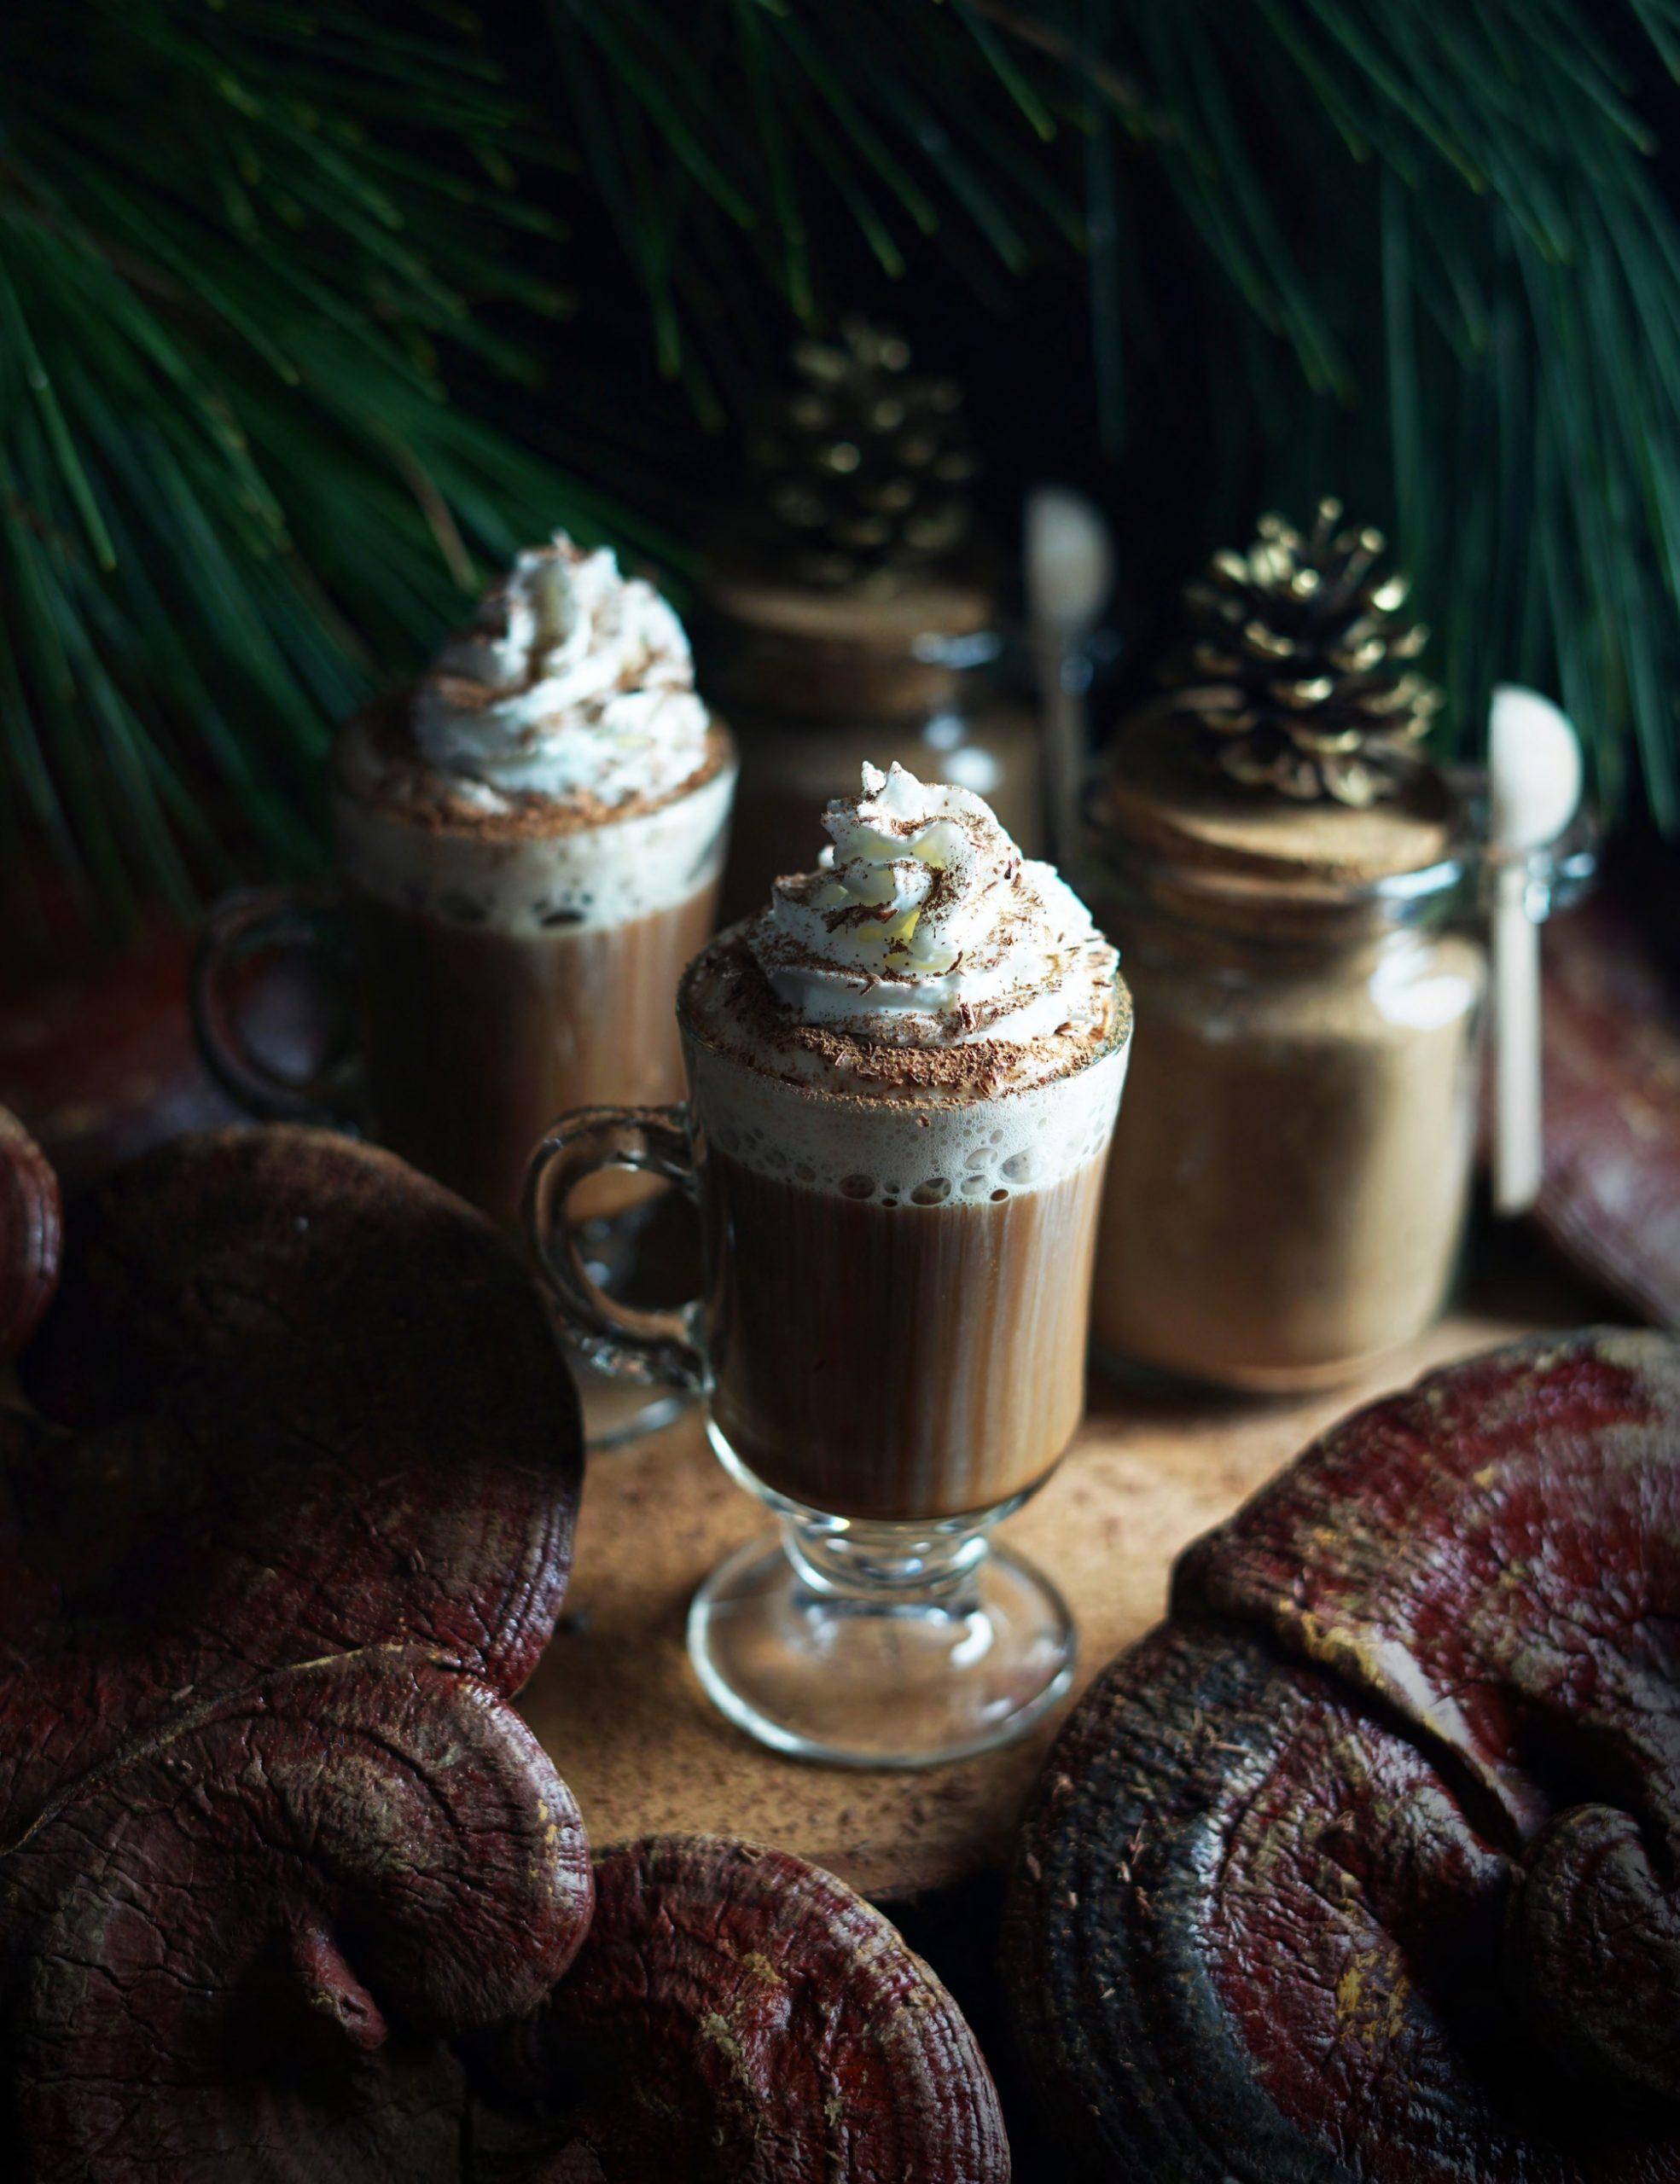 Medicinal Mushroom Cocoa by The Wo ndersmith